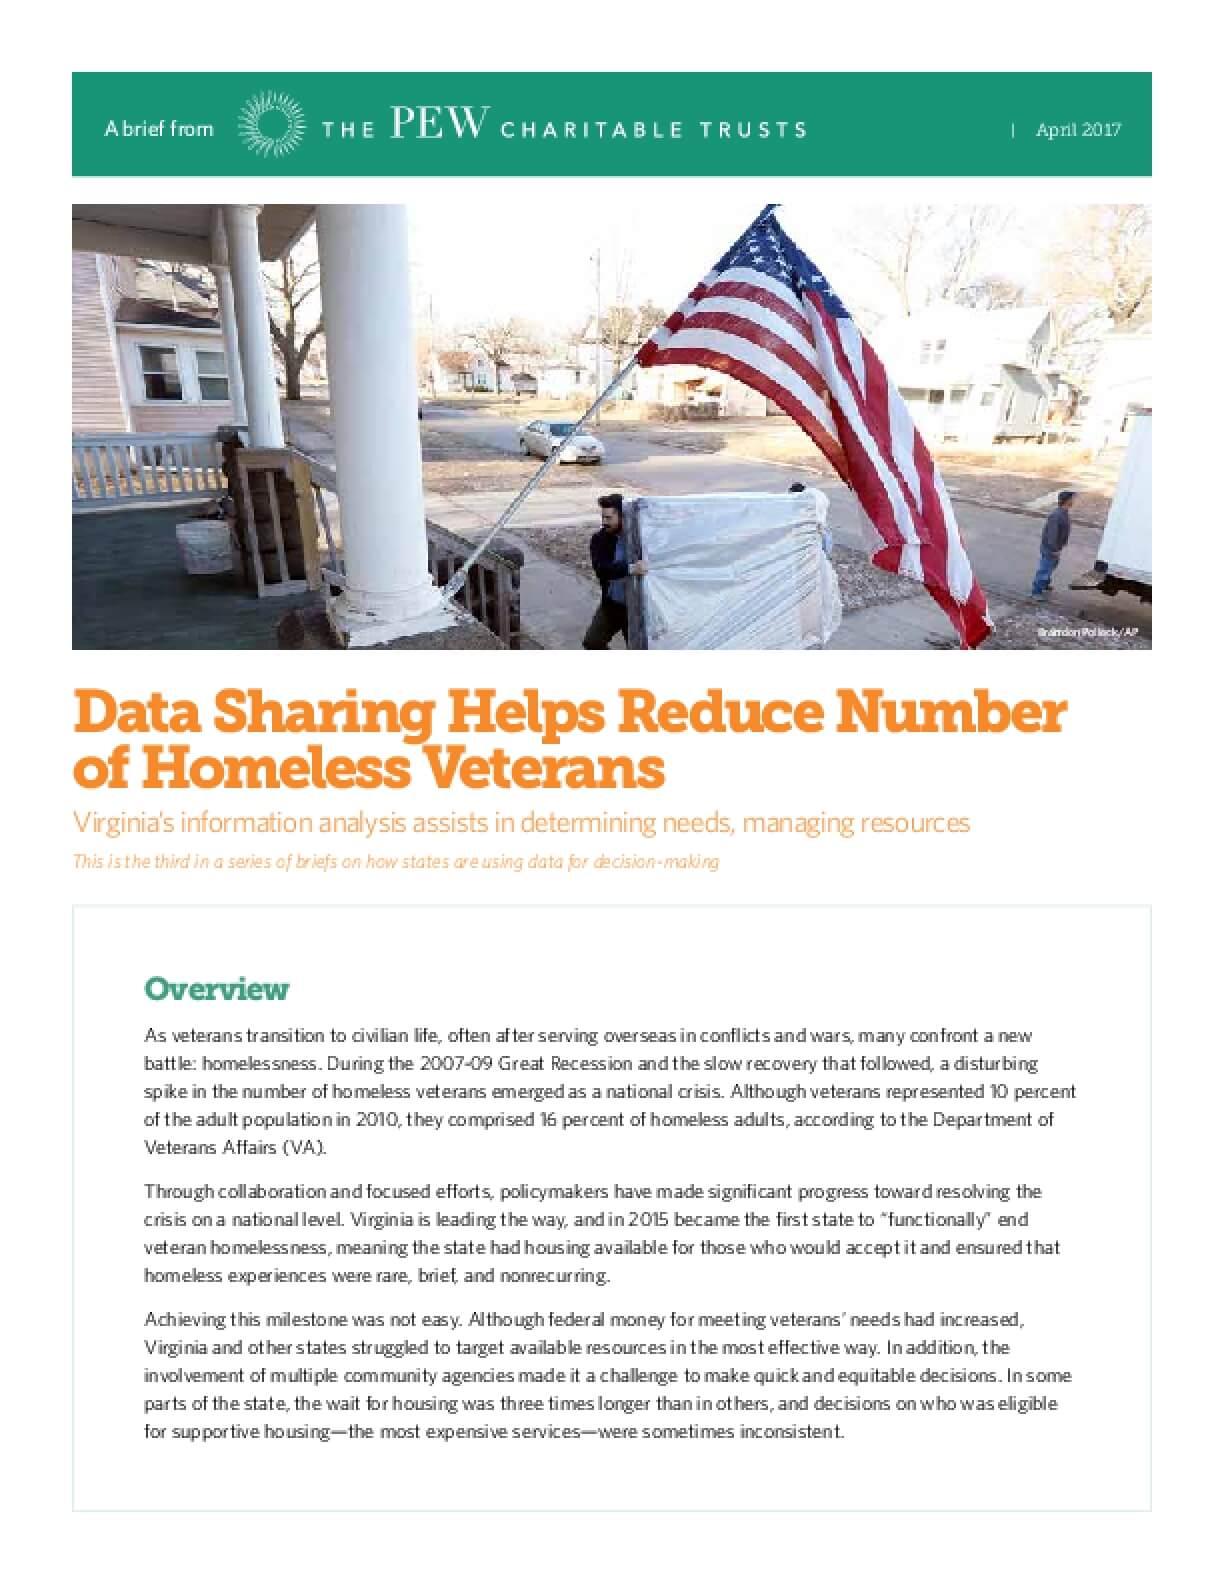 Data Sharing Helps Reduce Number of Homeless Veterans